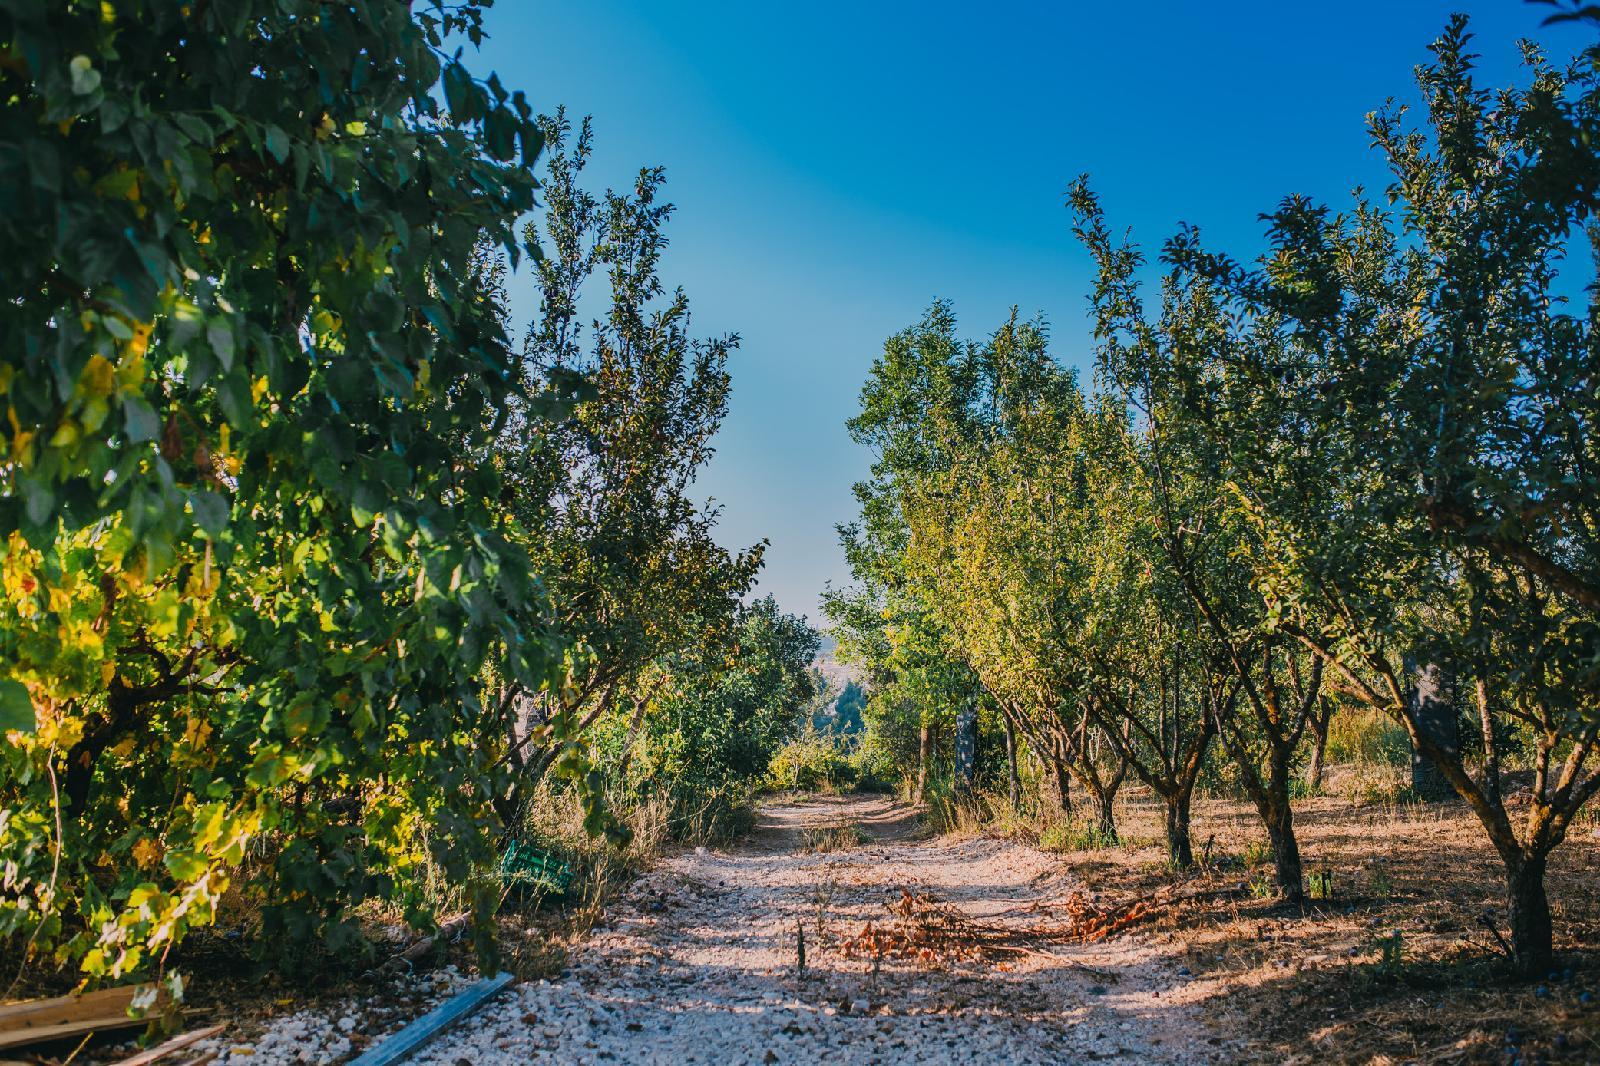 Tur Sinai Organic Farm Resort, Jerusalem Image 4